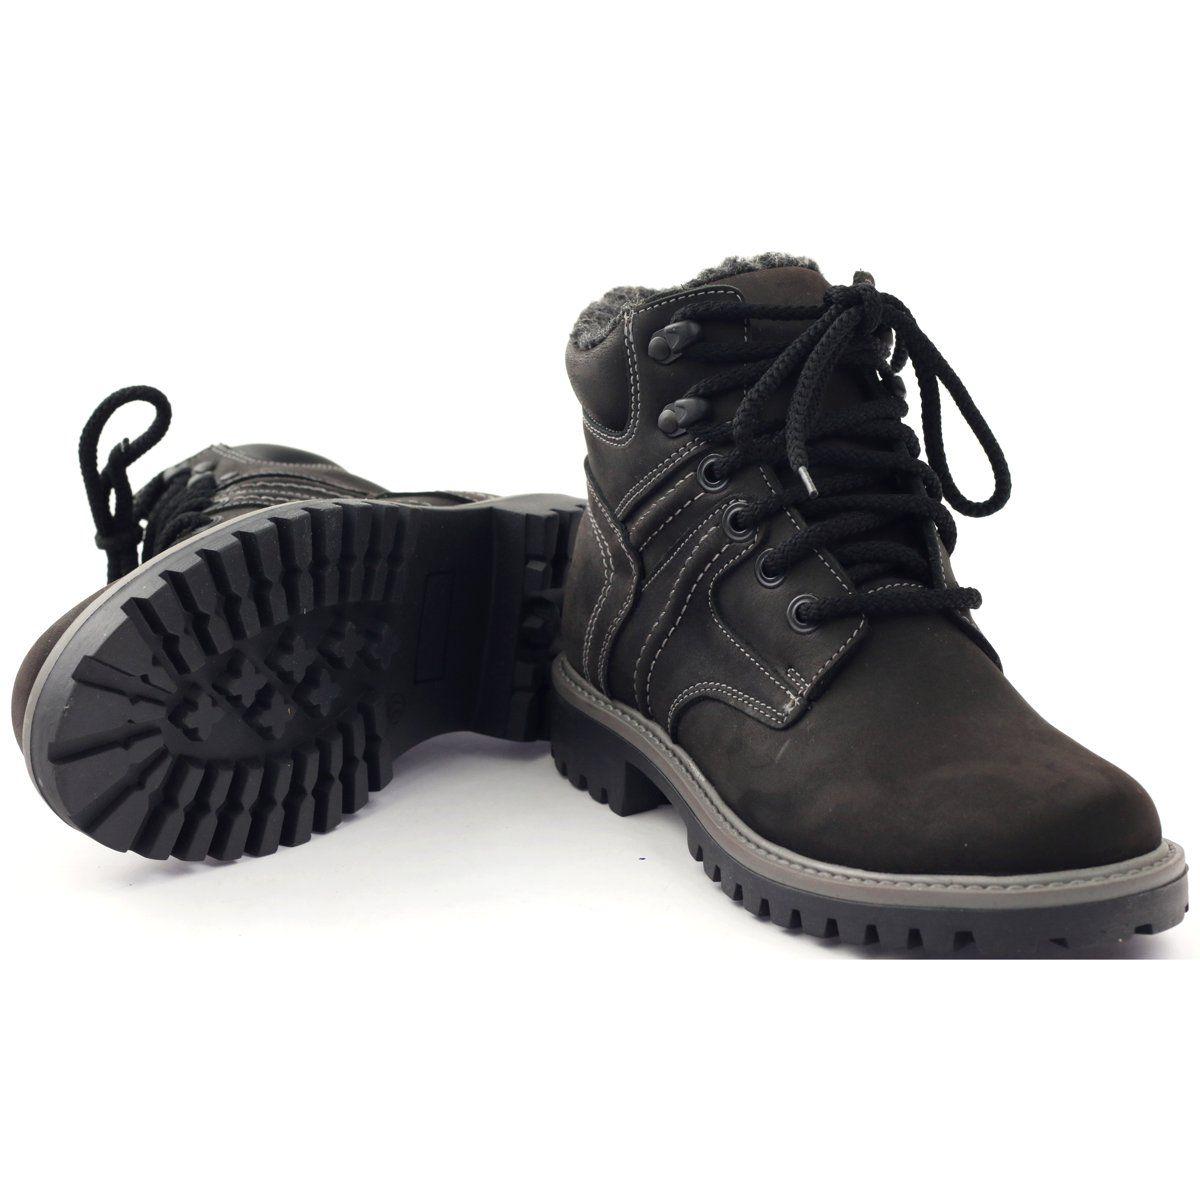 Trzewiki Traperki Zimowe Naszbut 831 Czarne Shoes Keep Shoes Shoe Laces